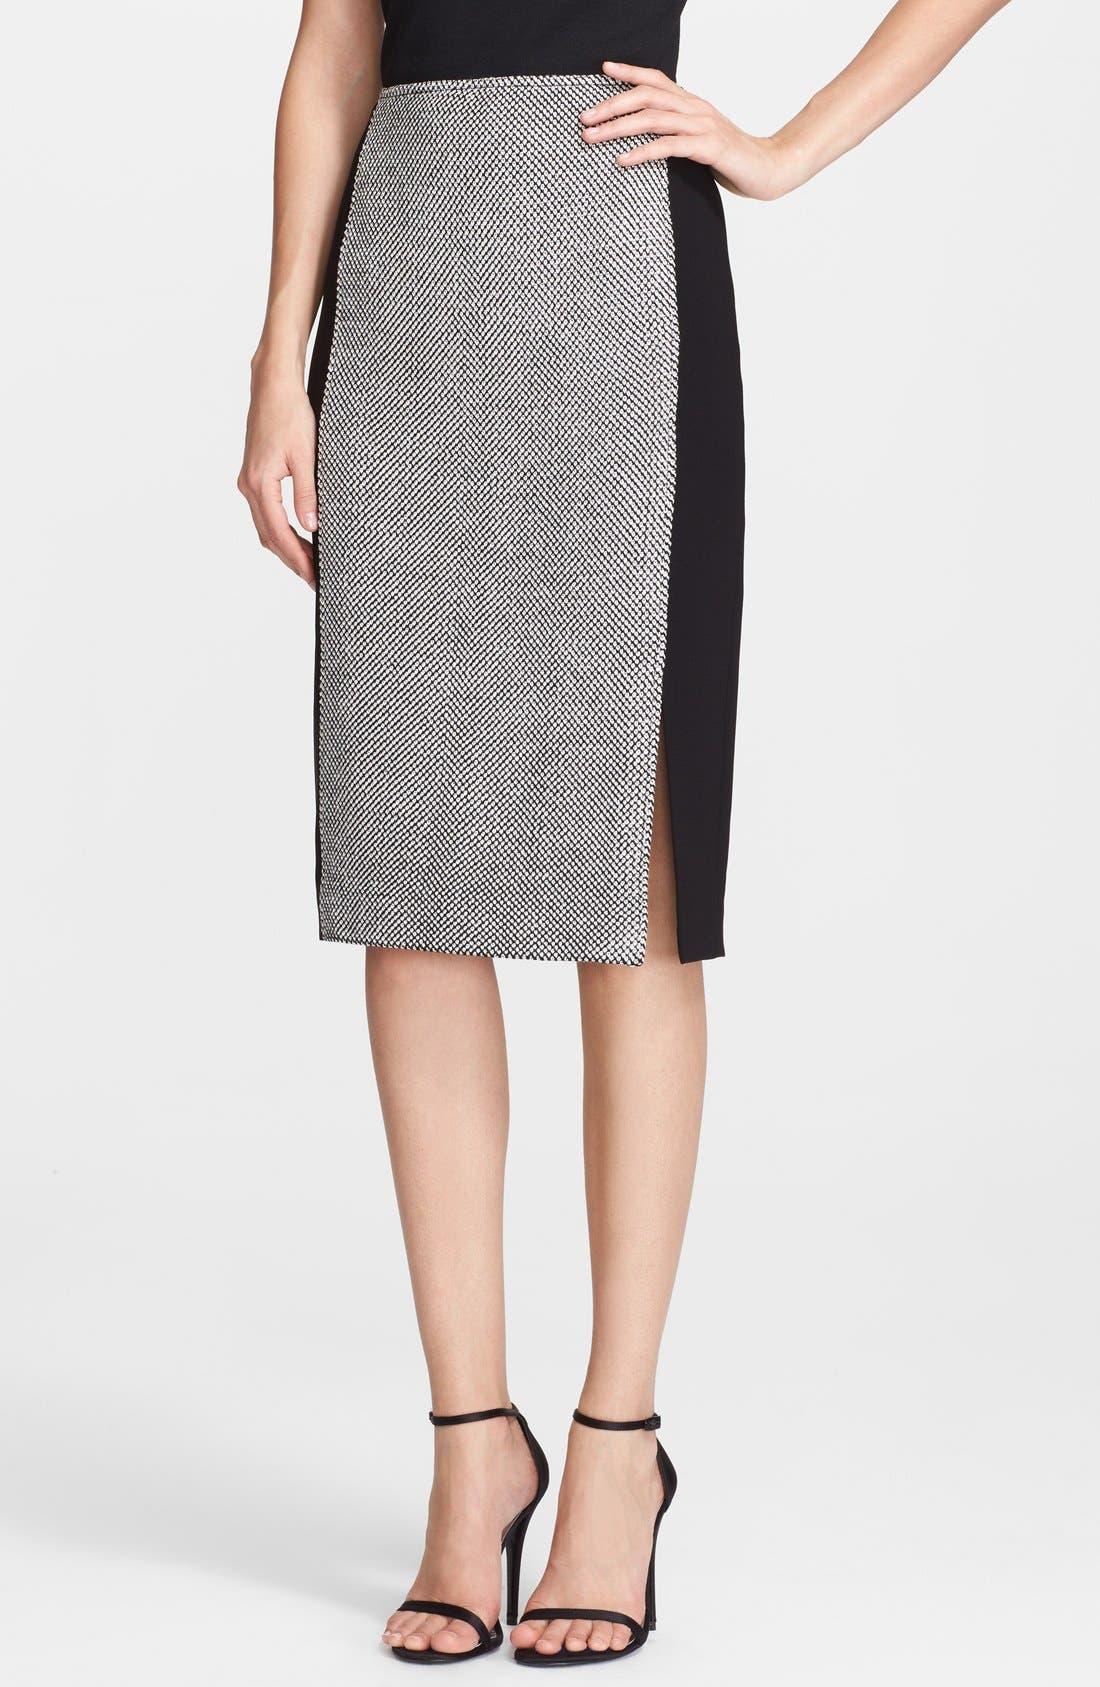 Alternate Image 1 Selected - St. John Collection Bird's Eye Tweed & Crepe Marocain Skirt